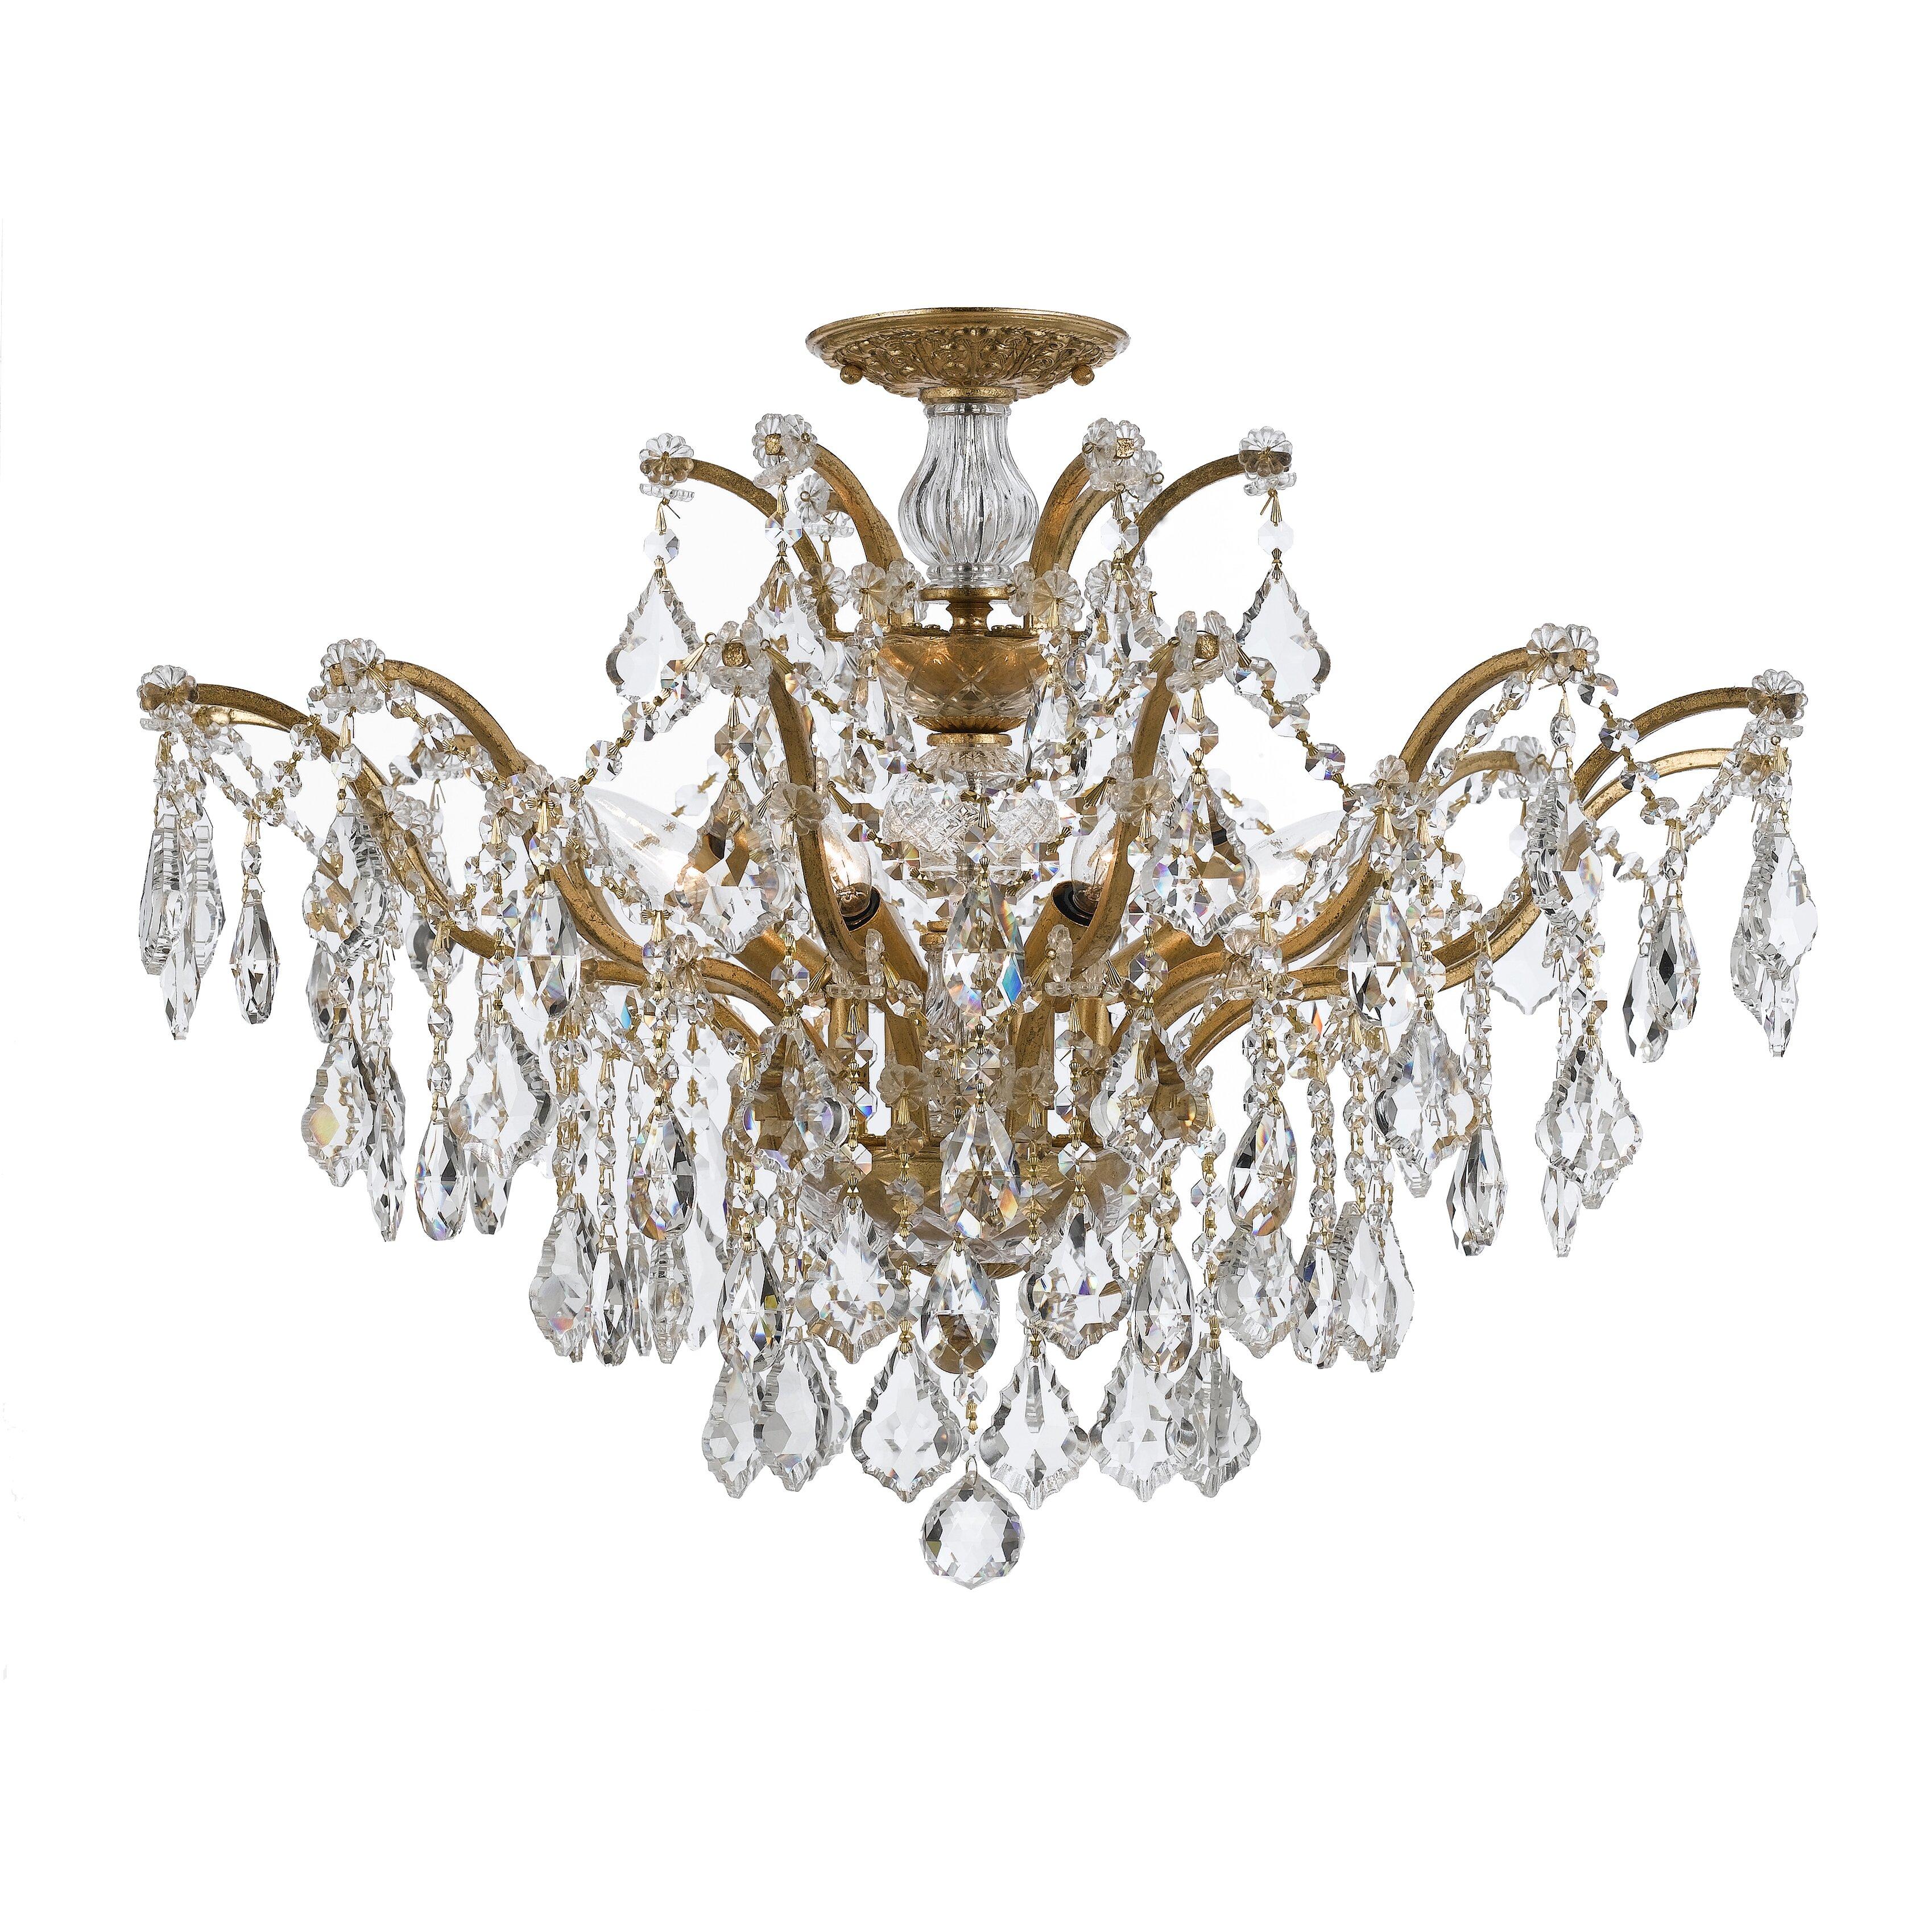 Crystorama filmore 6 light crystal chandelier reviews for 6 light crystal chandelier